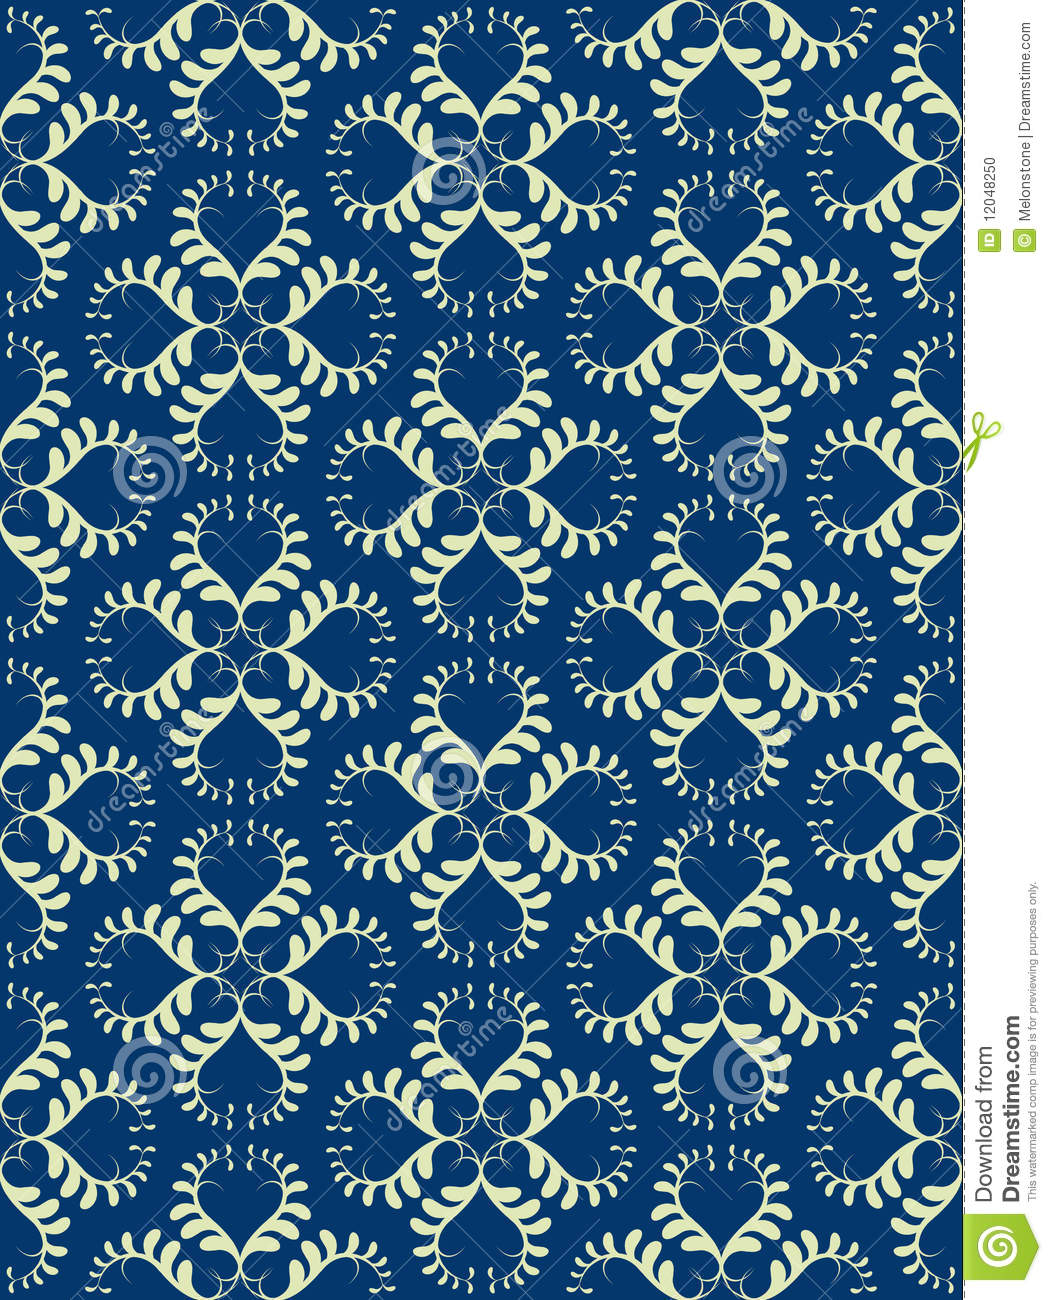 Royal Blue Wallpaper Stock Photo - Image: 12048250